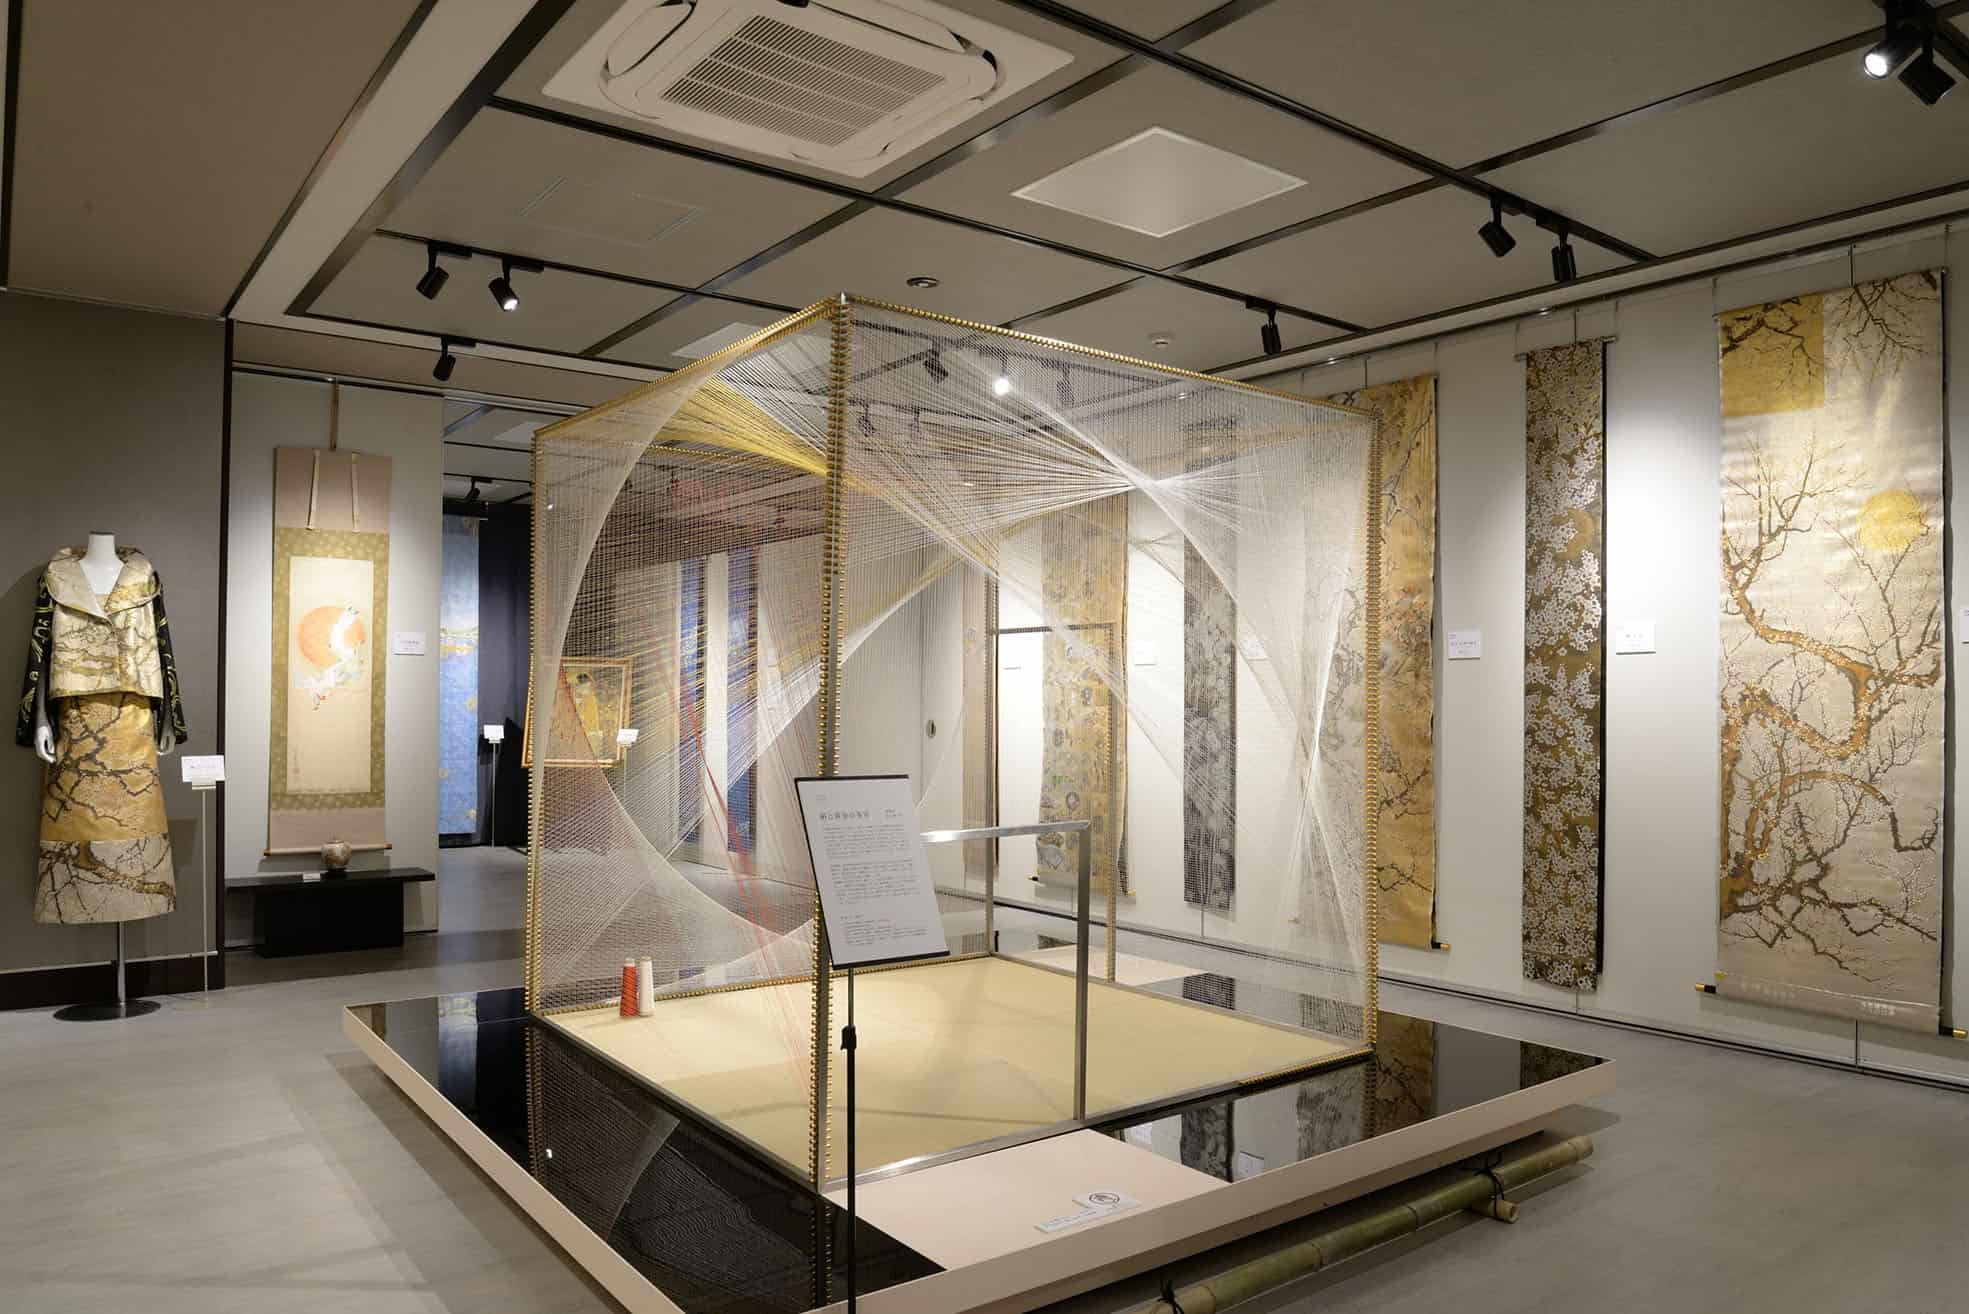 visit the Nishijin Textile Center